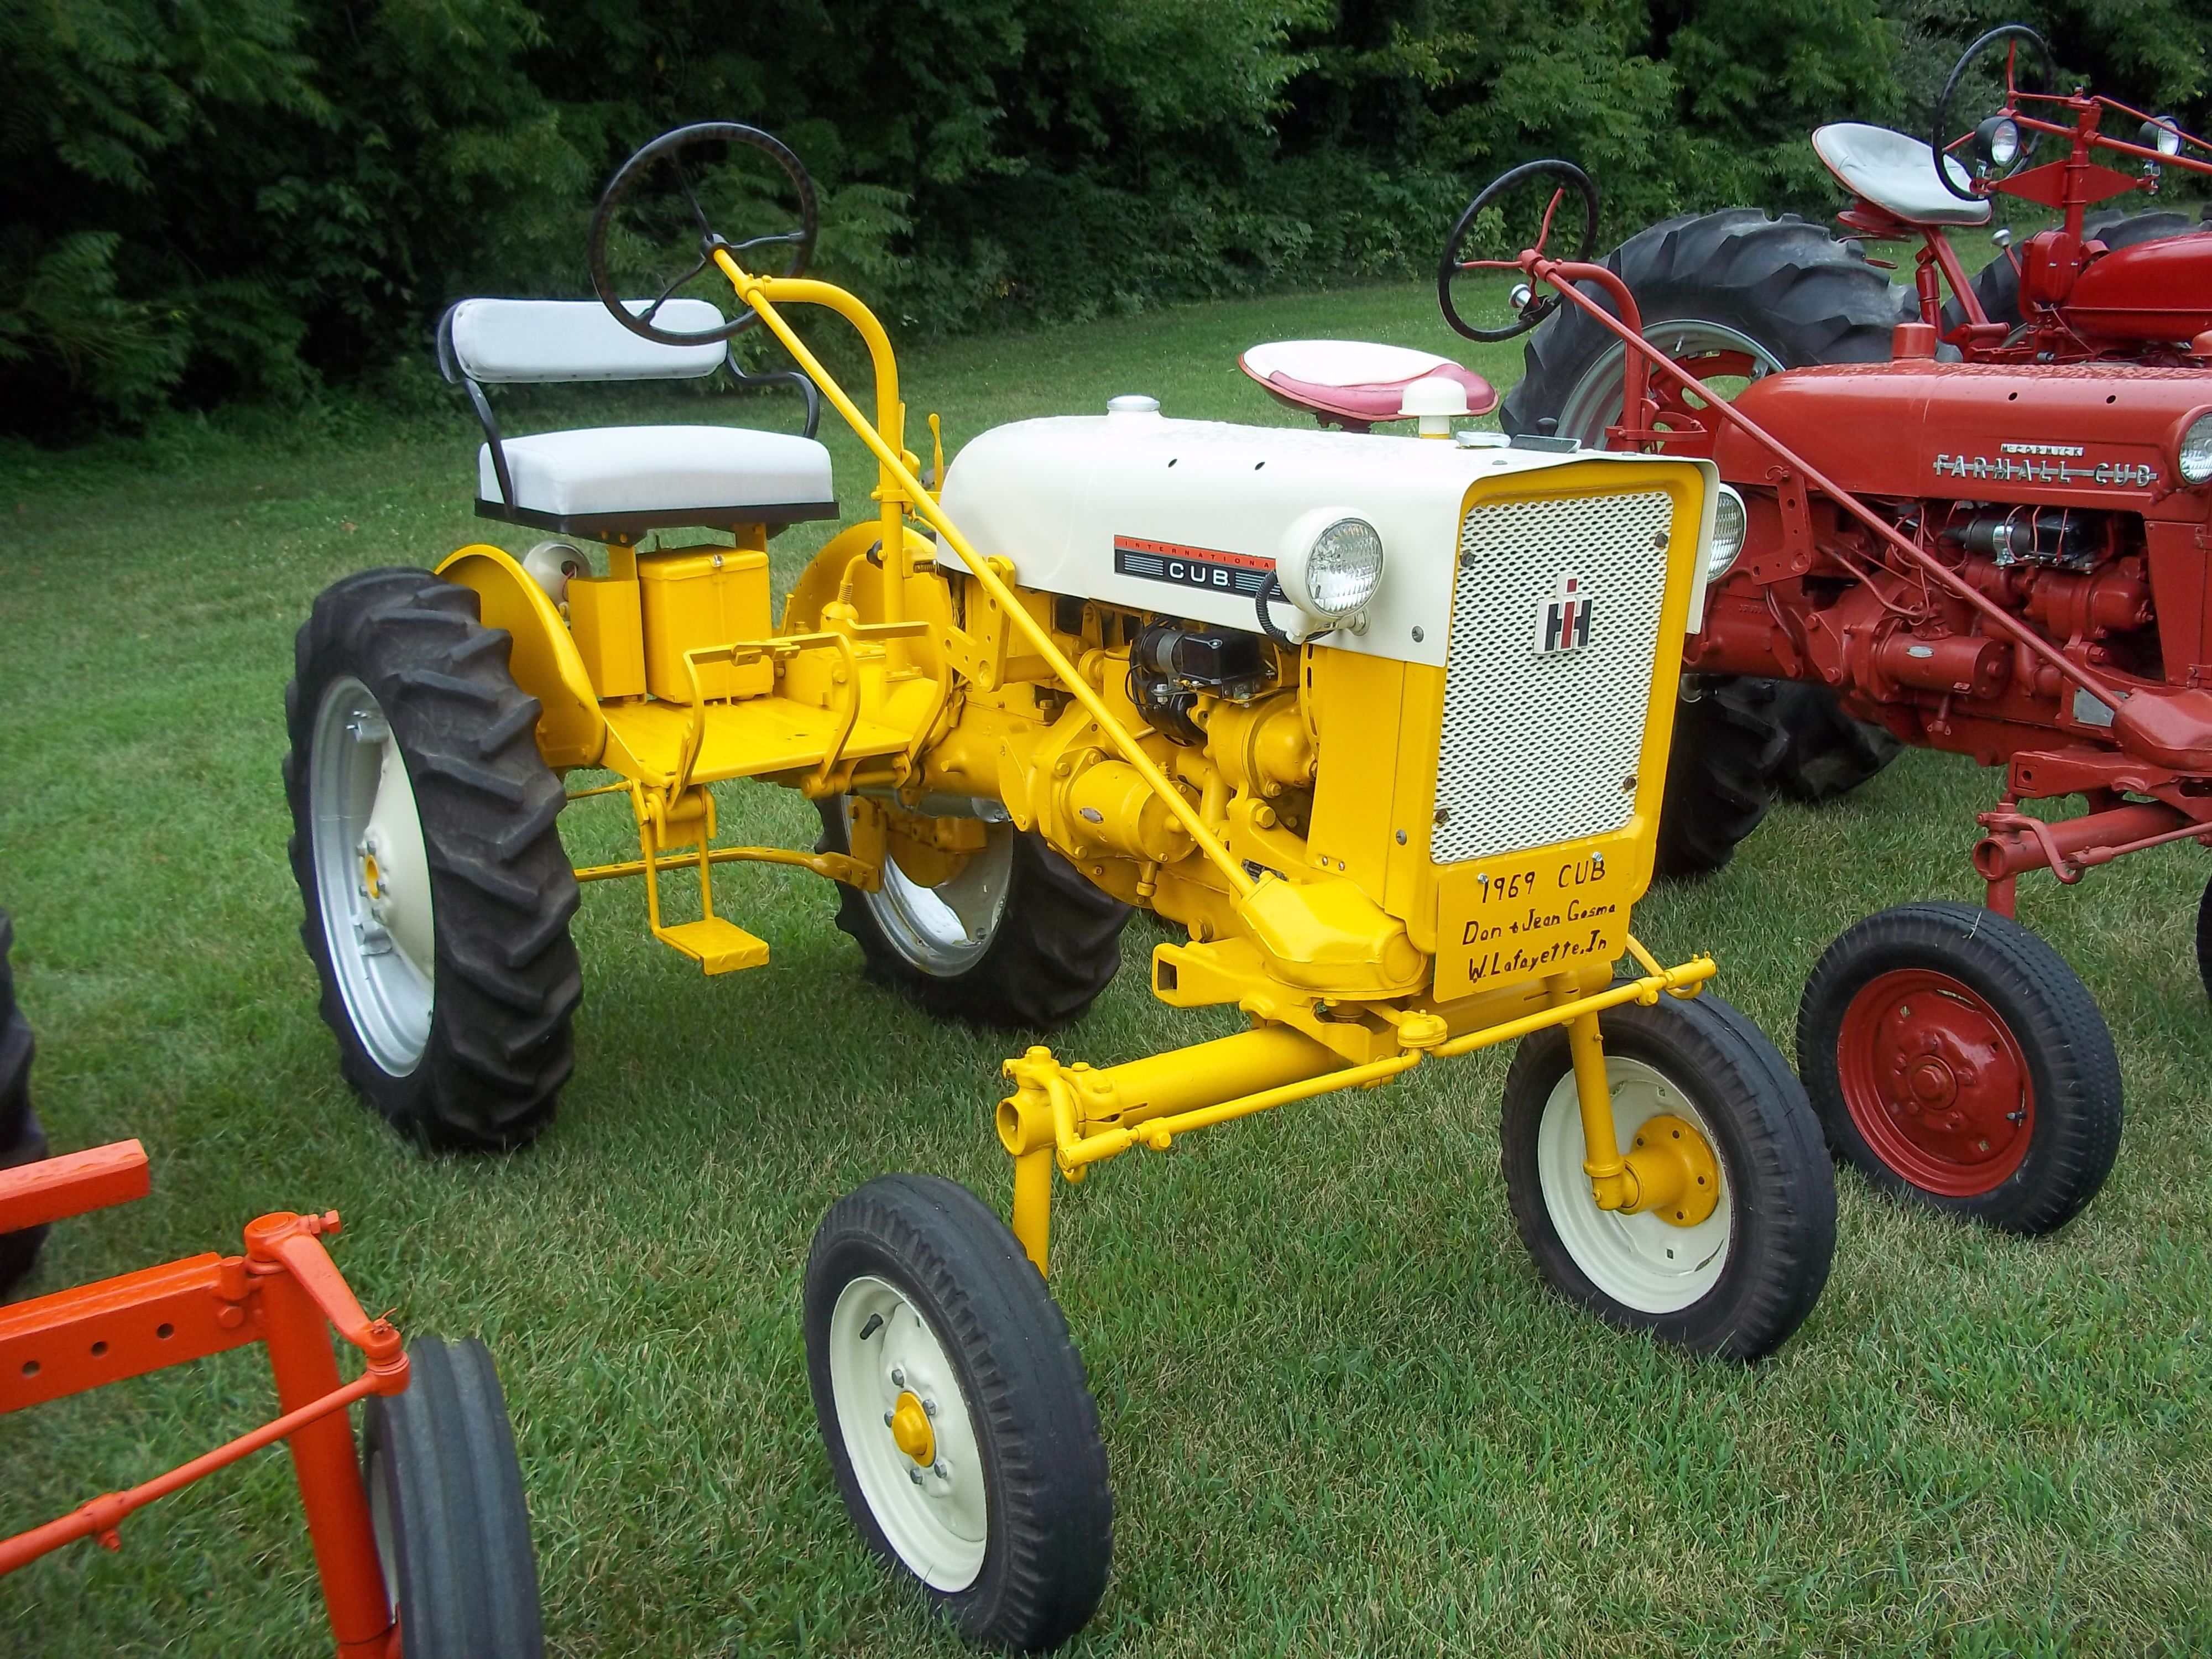 Cub cadet international farmall pinterest tractor for Yard and garden equipment